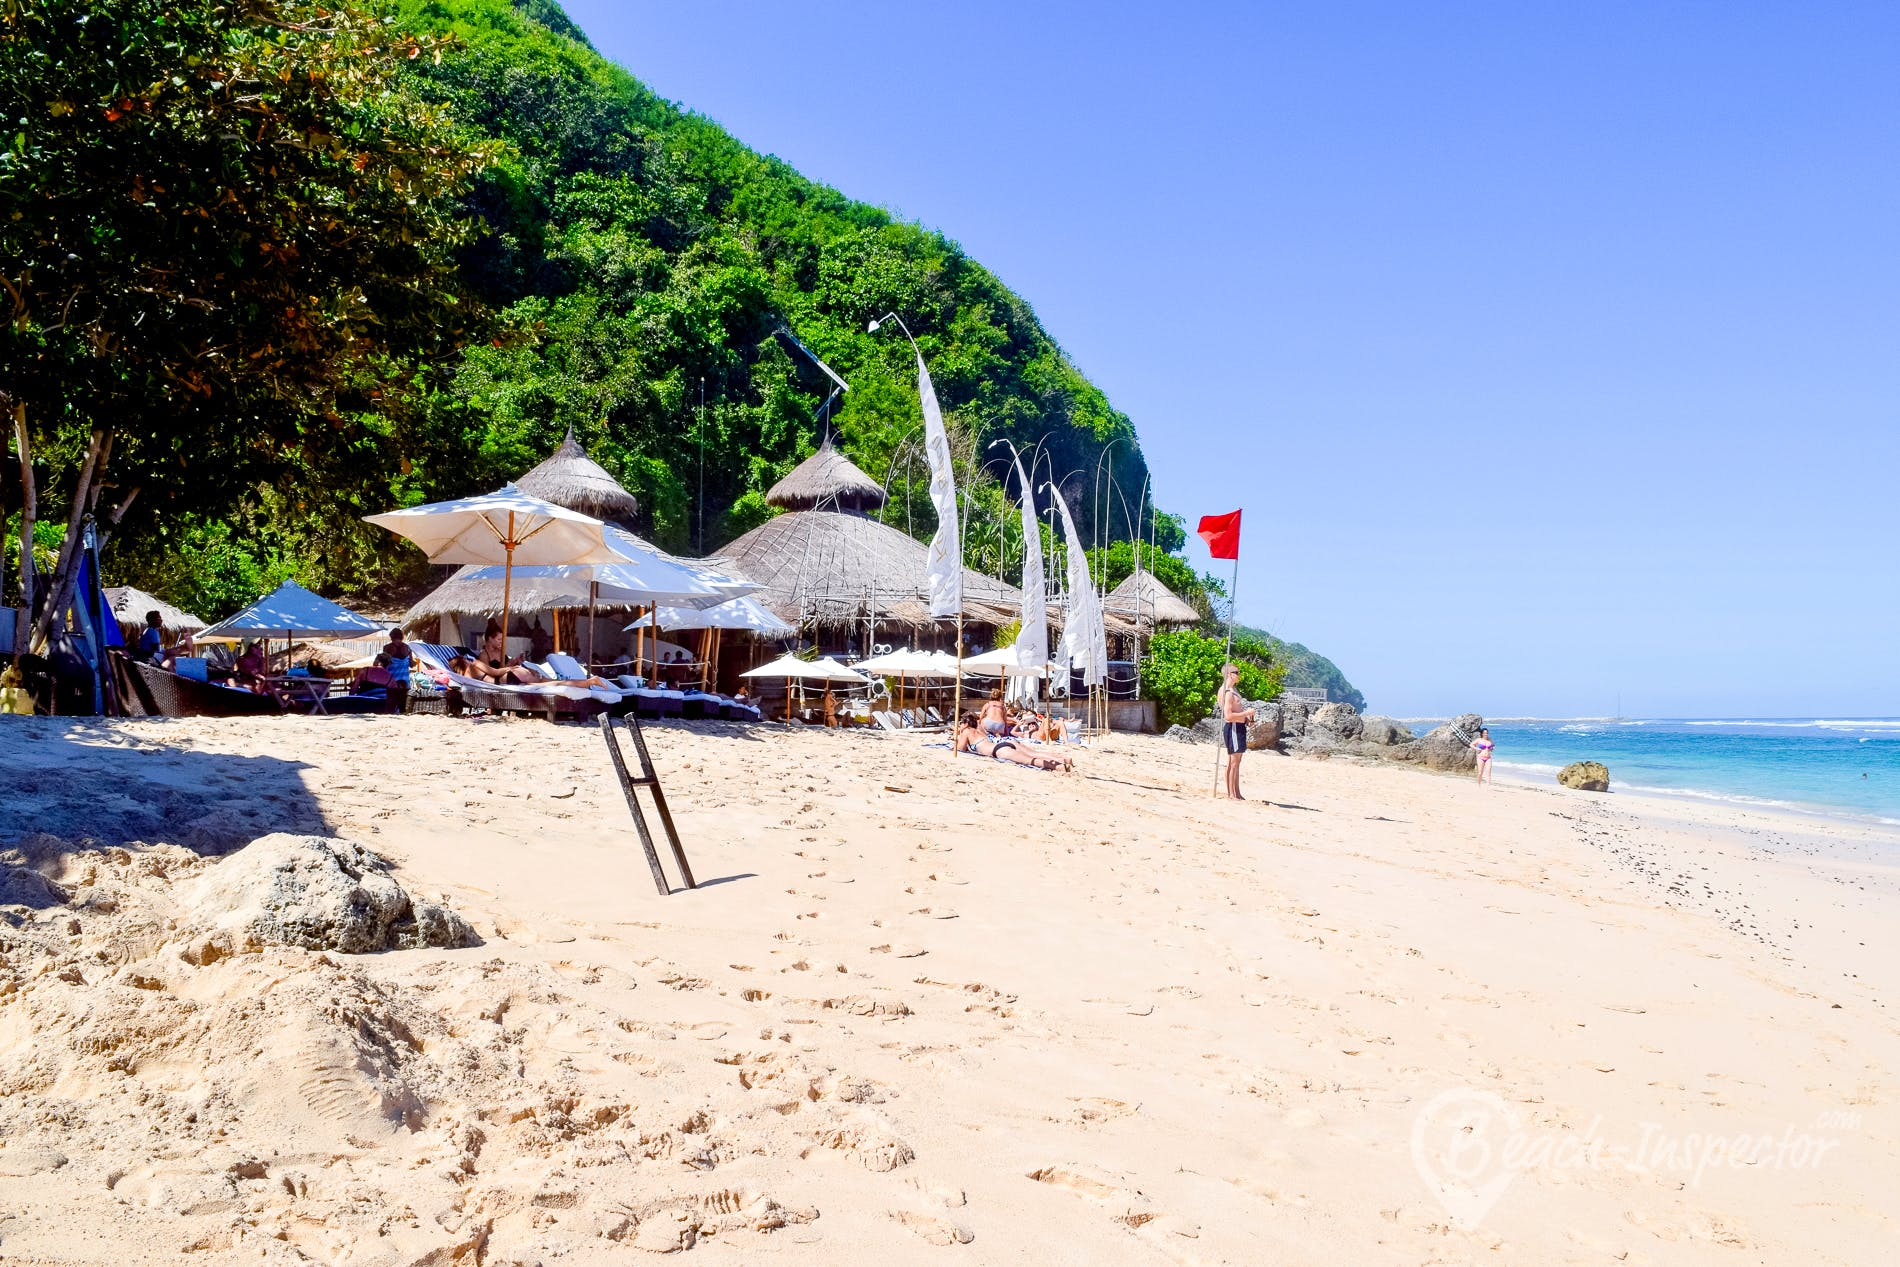 Playa Ungasan Beach, Bali, Indonesia